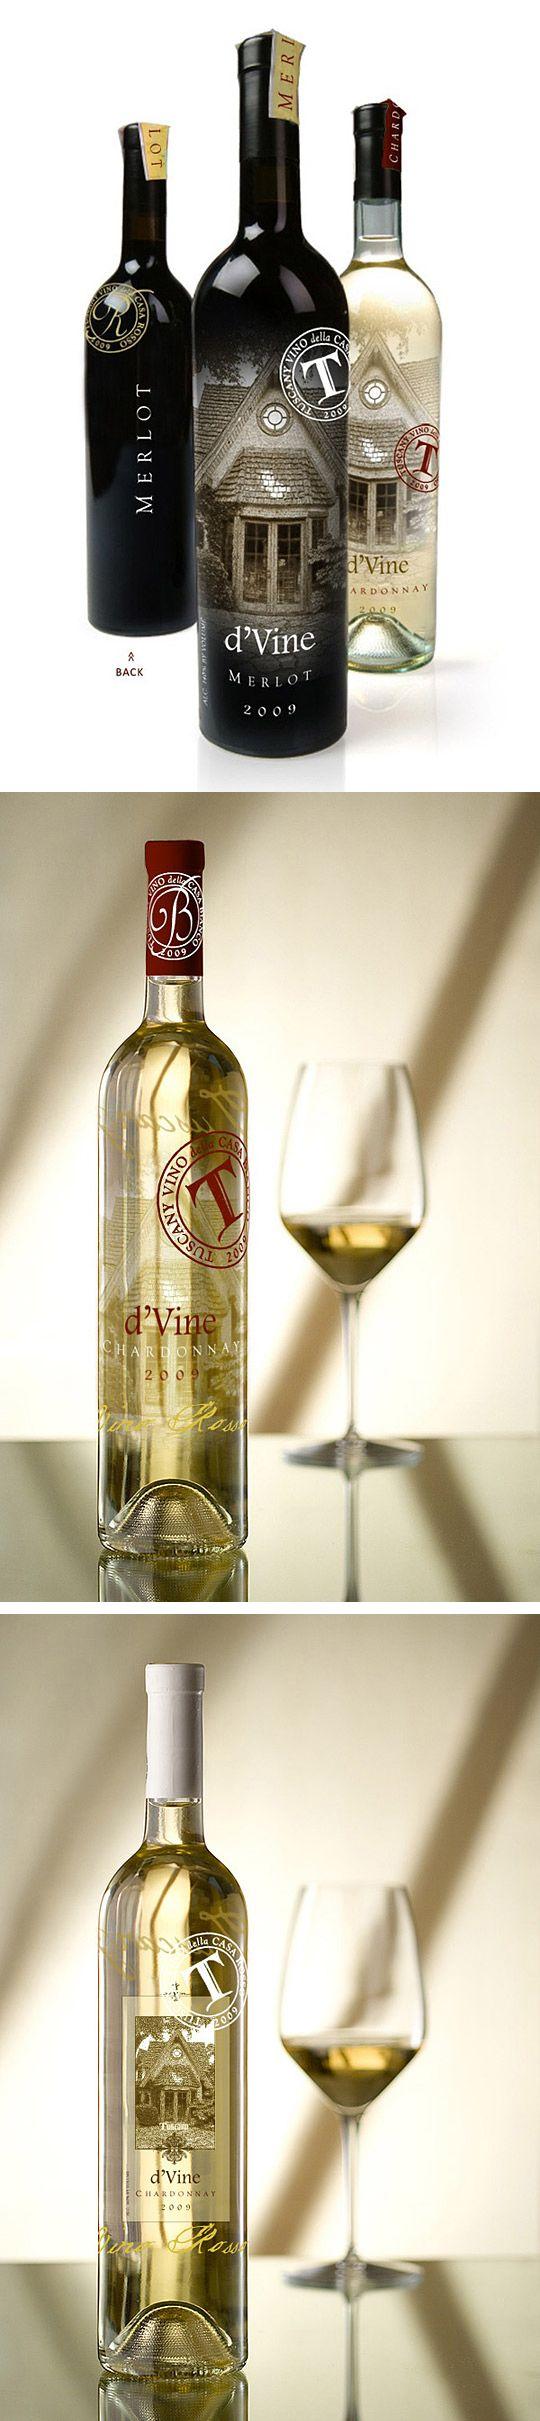 Tuscany & Franck's Restaurant Wine Bottle Designs by Rod Burkholz